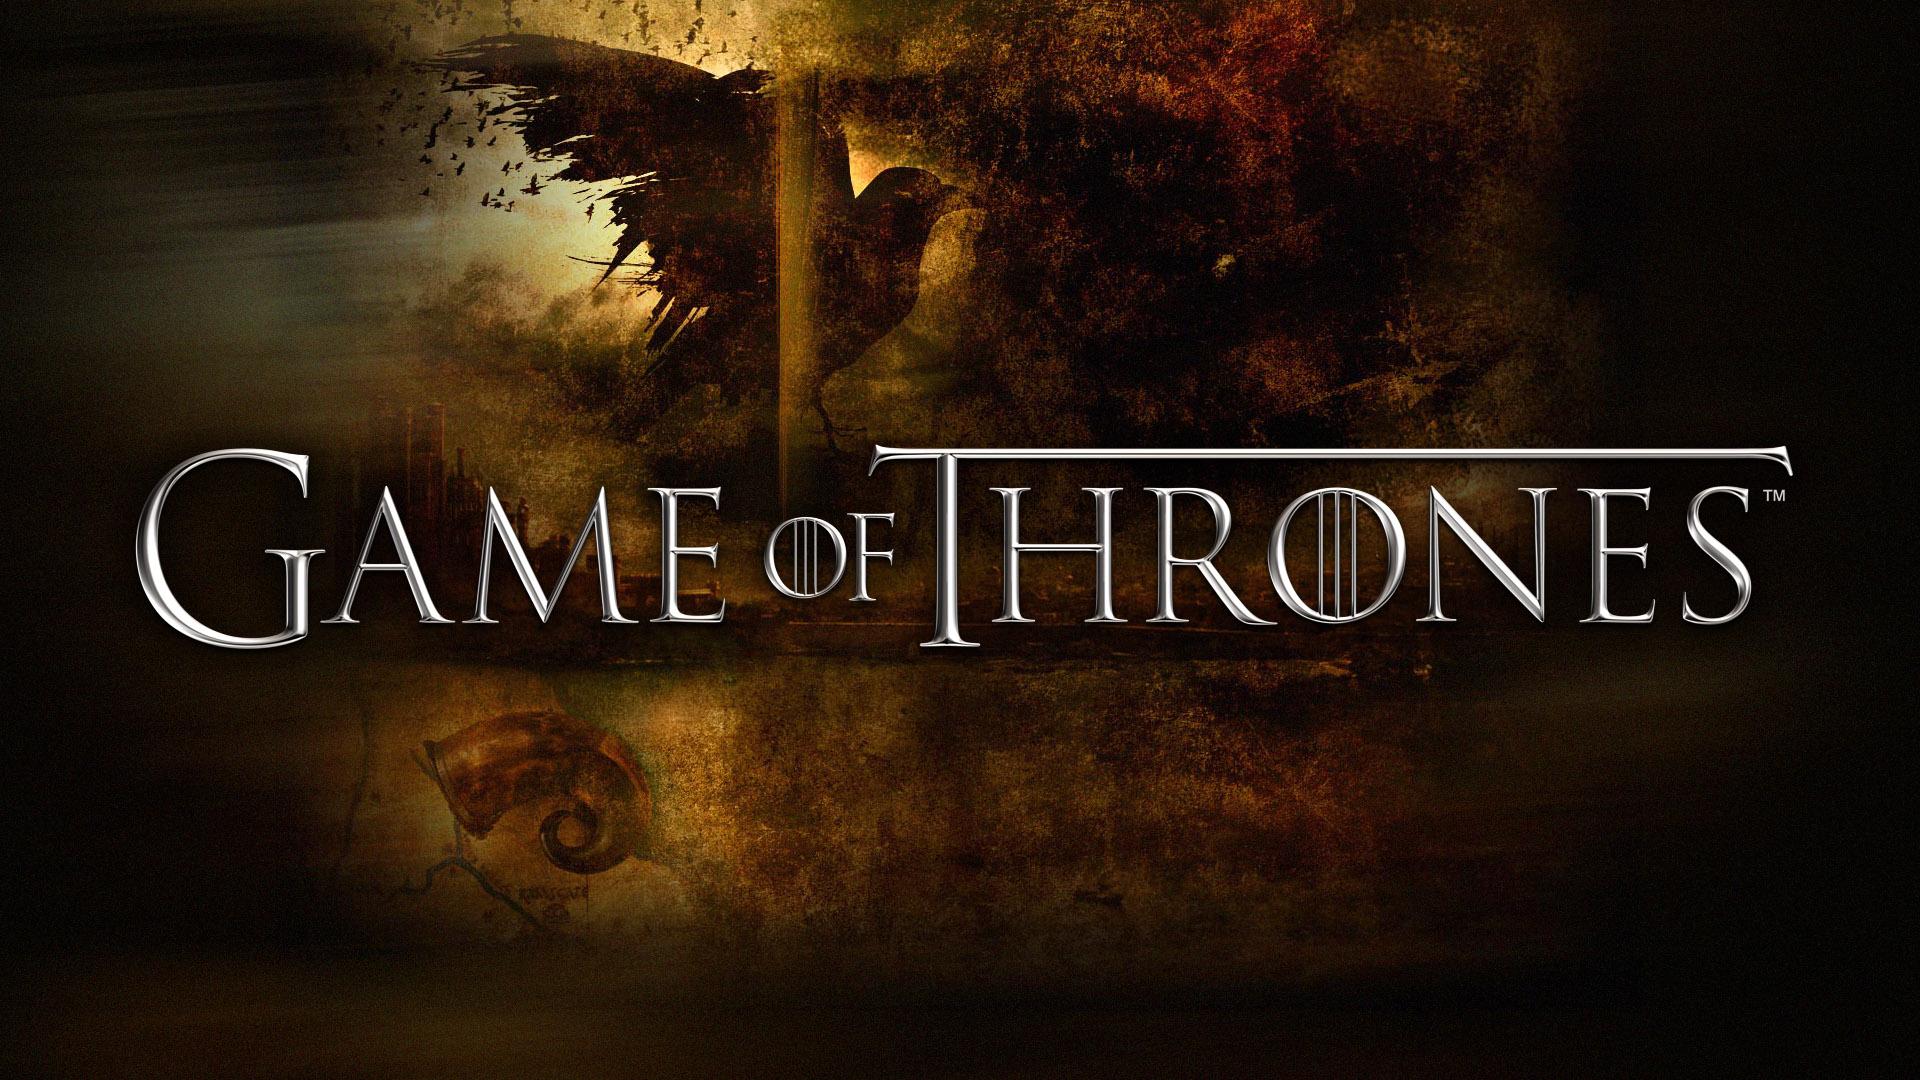 Game Of Thrones Season 3 Wallpaper HD 6987059 1920x1080